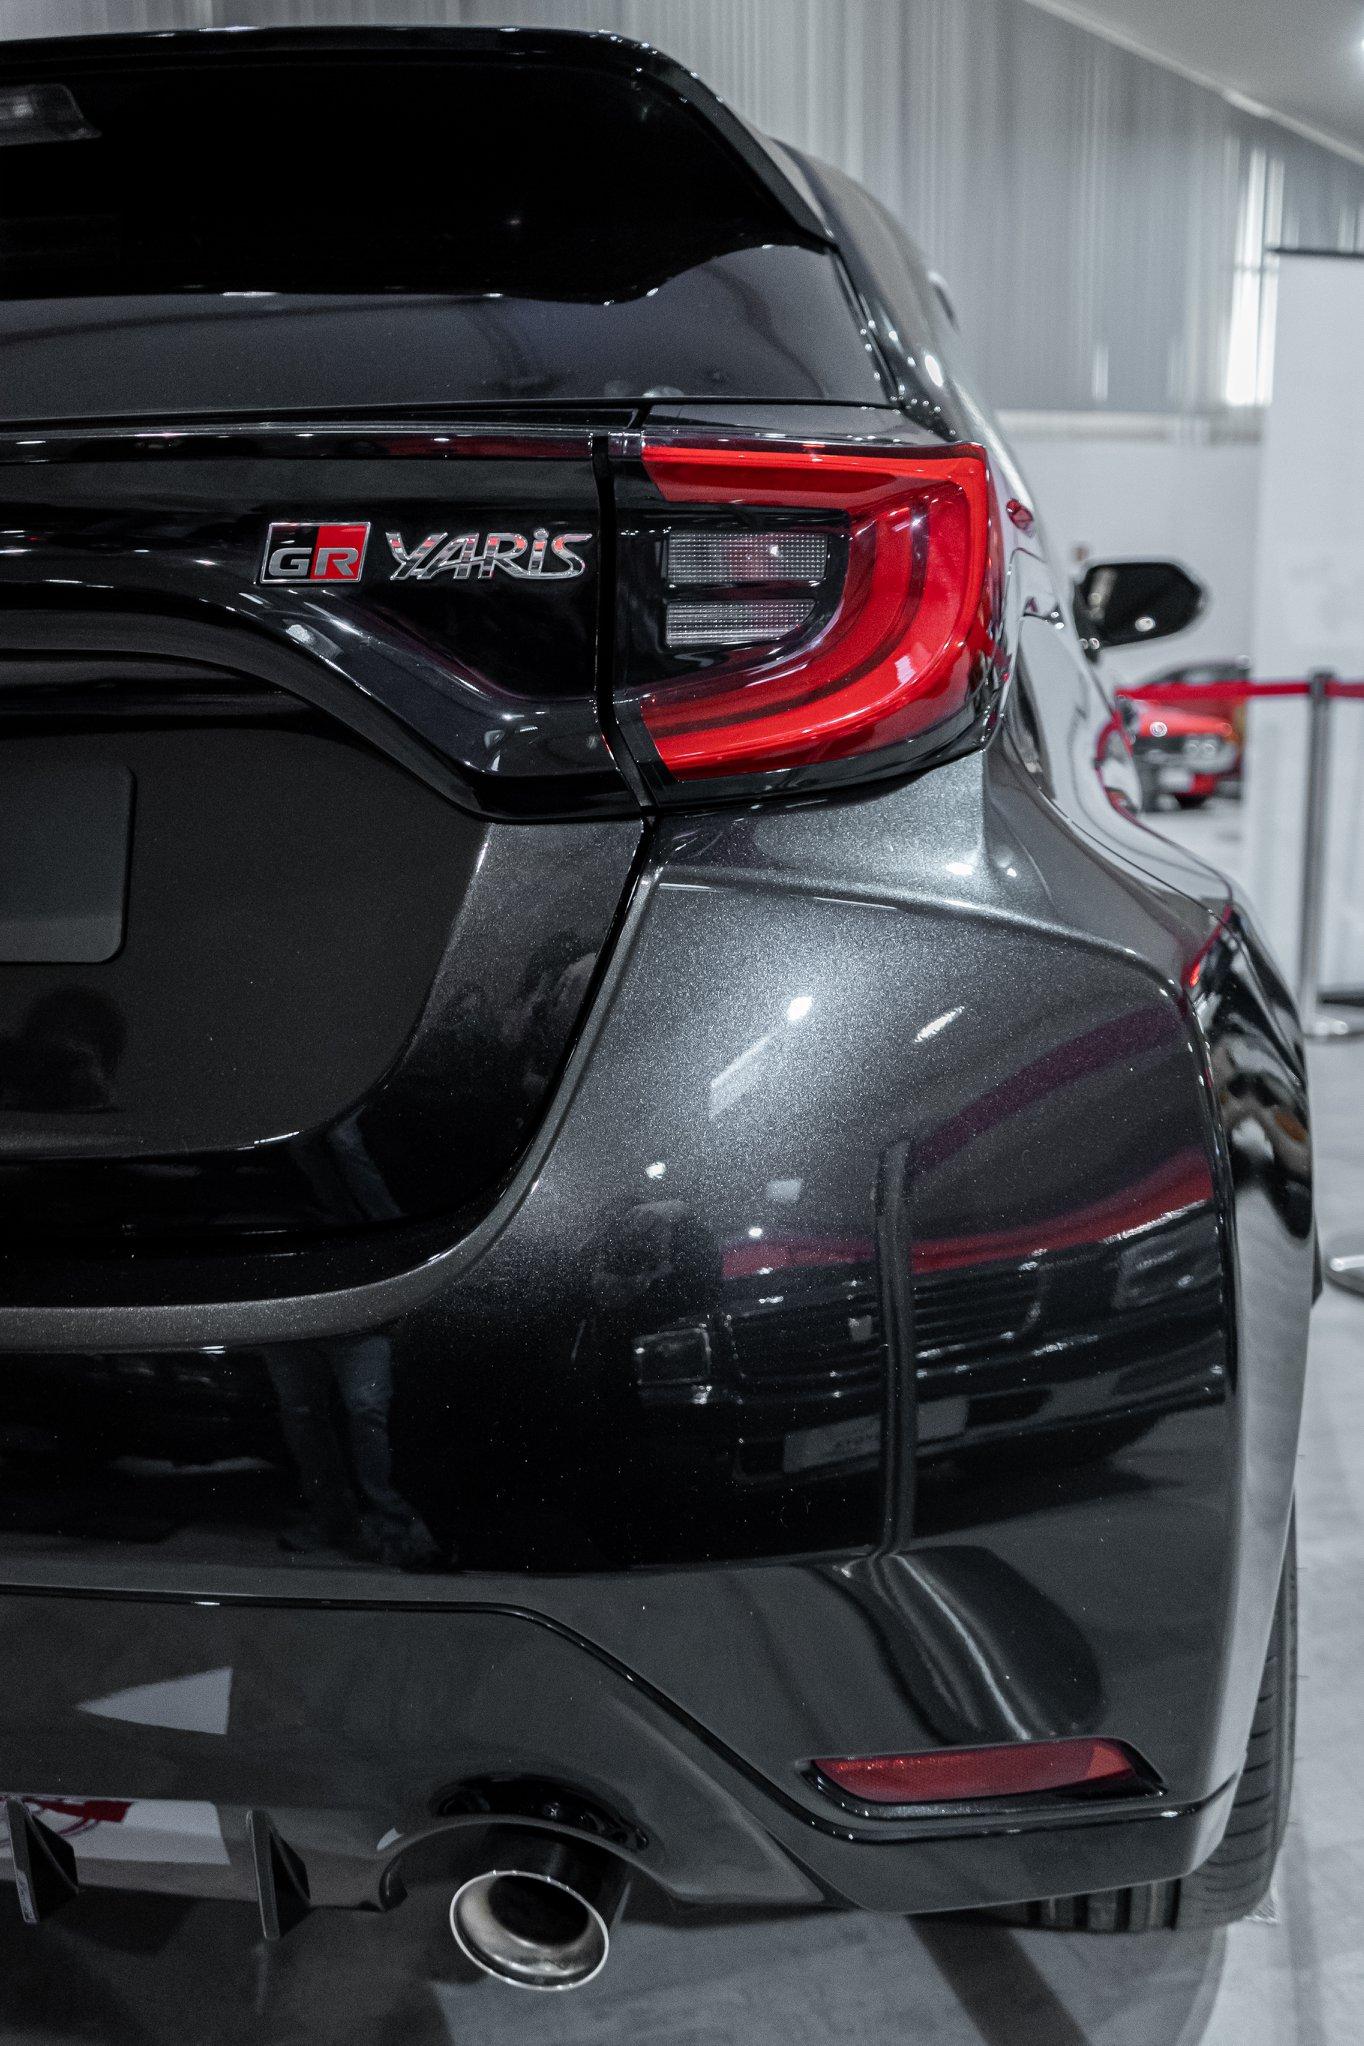 Bmlack_Toyota_GR_Yaris_0010